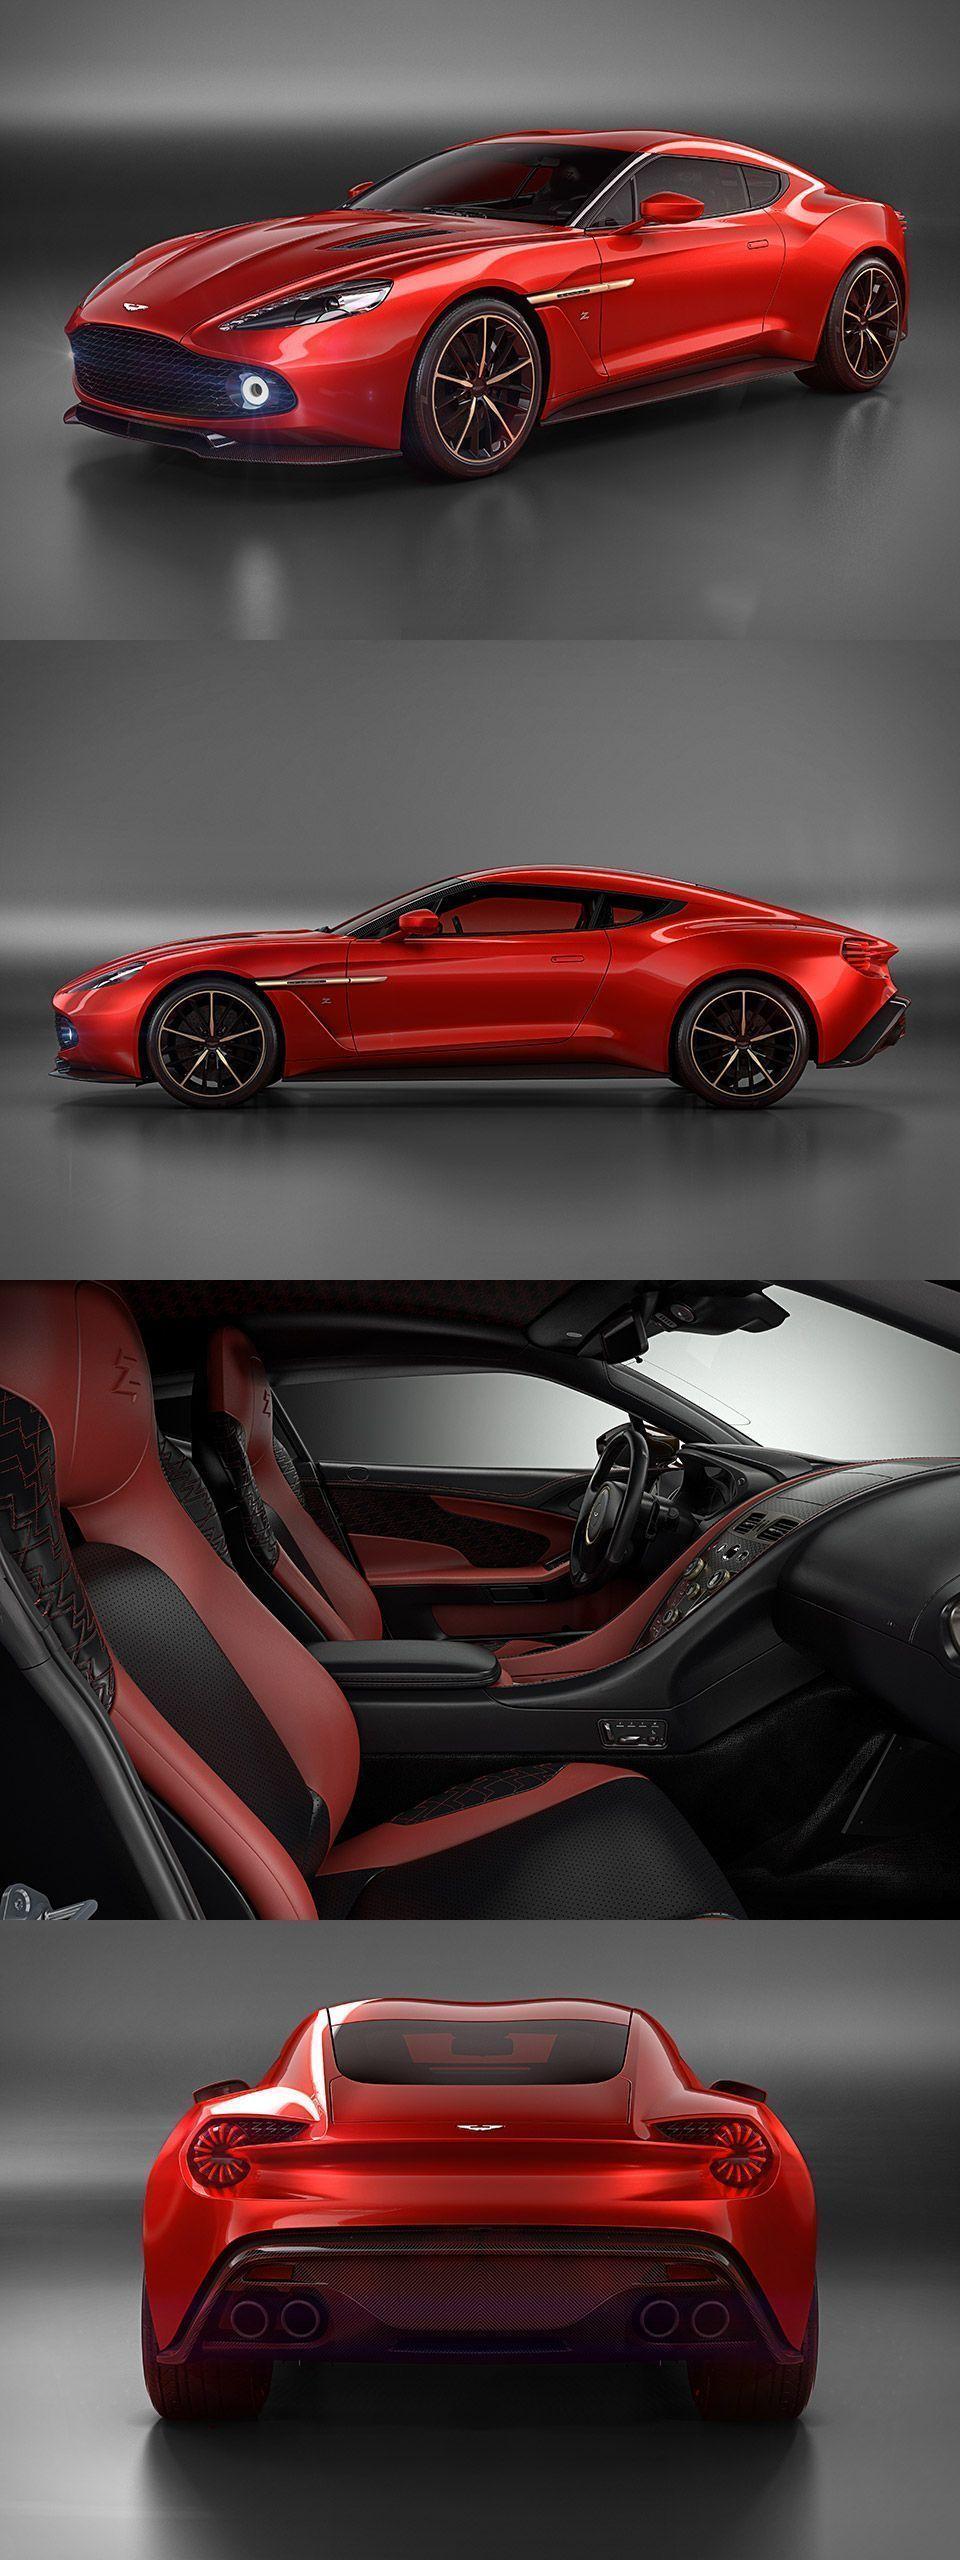 Aston Martin Vanquish Zagato Concept AstonMartin